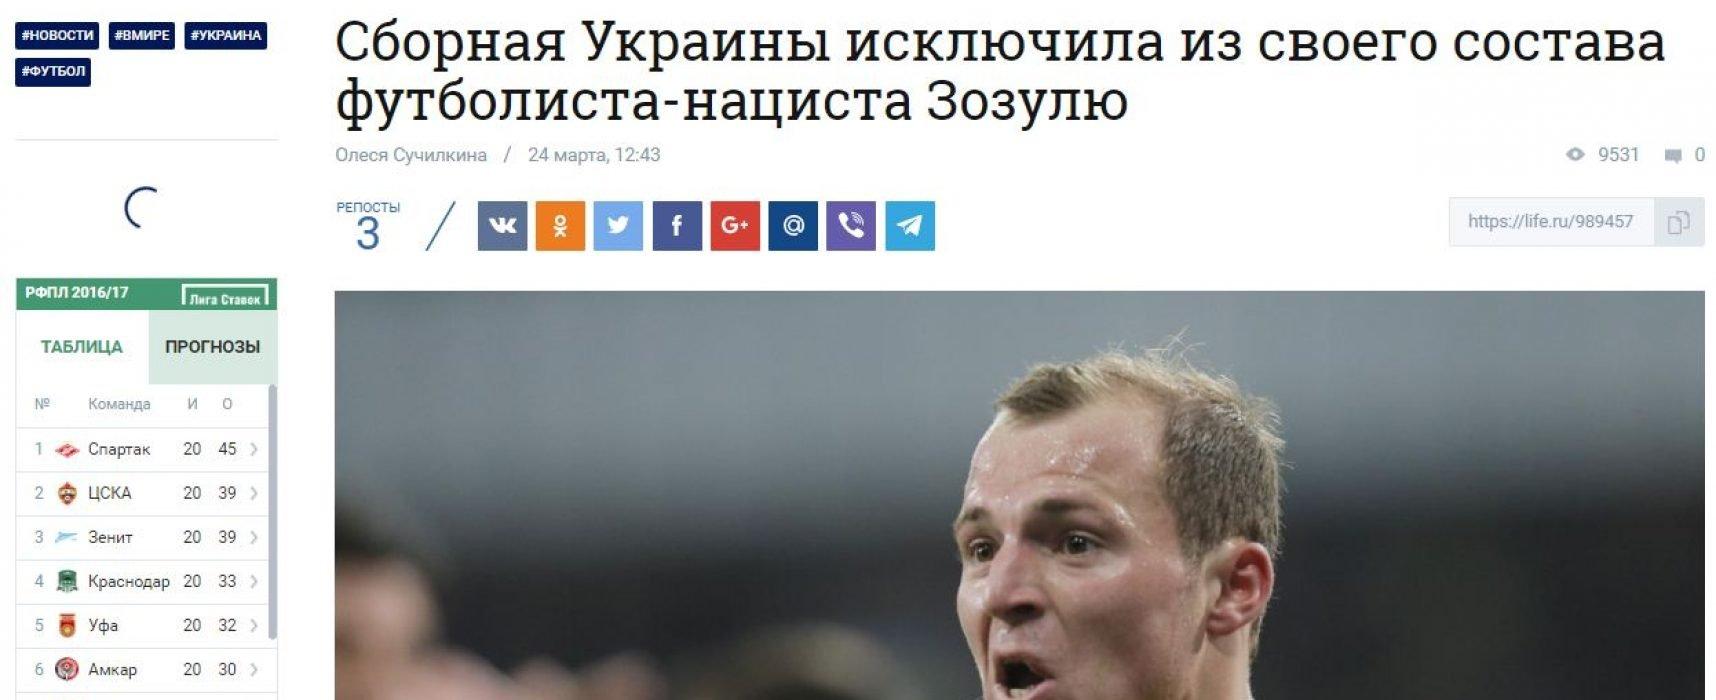 Fake: Ukraine National Team Excludes Zozulya